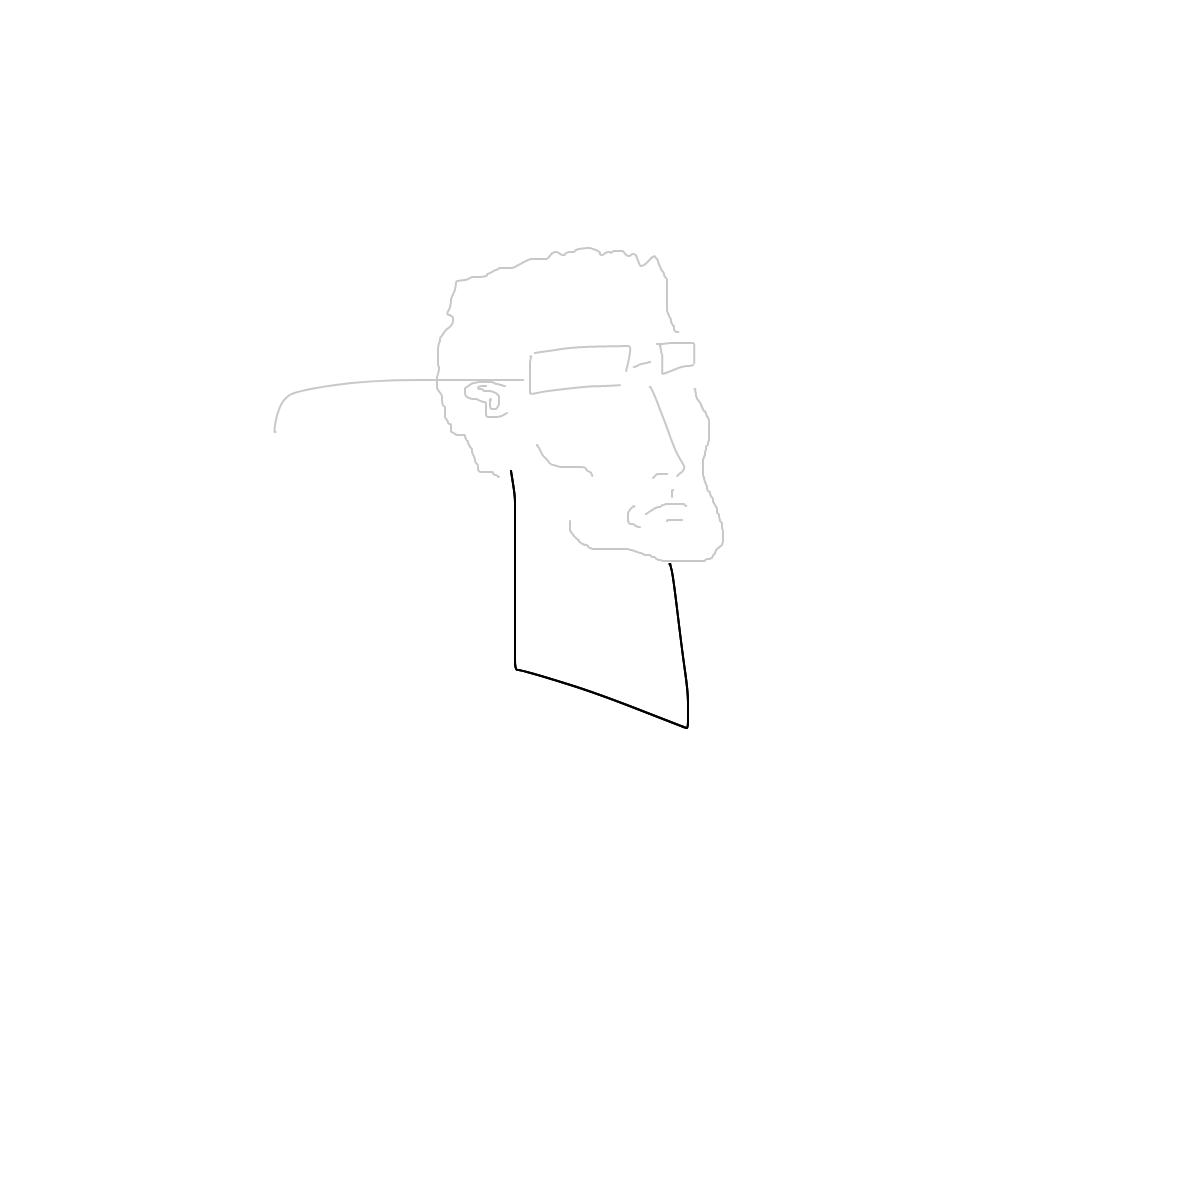 BAAAM drawing#23621 lat:45.7998504638671900lng: 15.9283628463745120